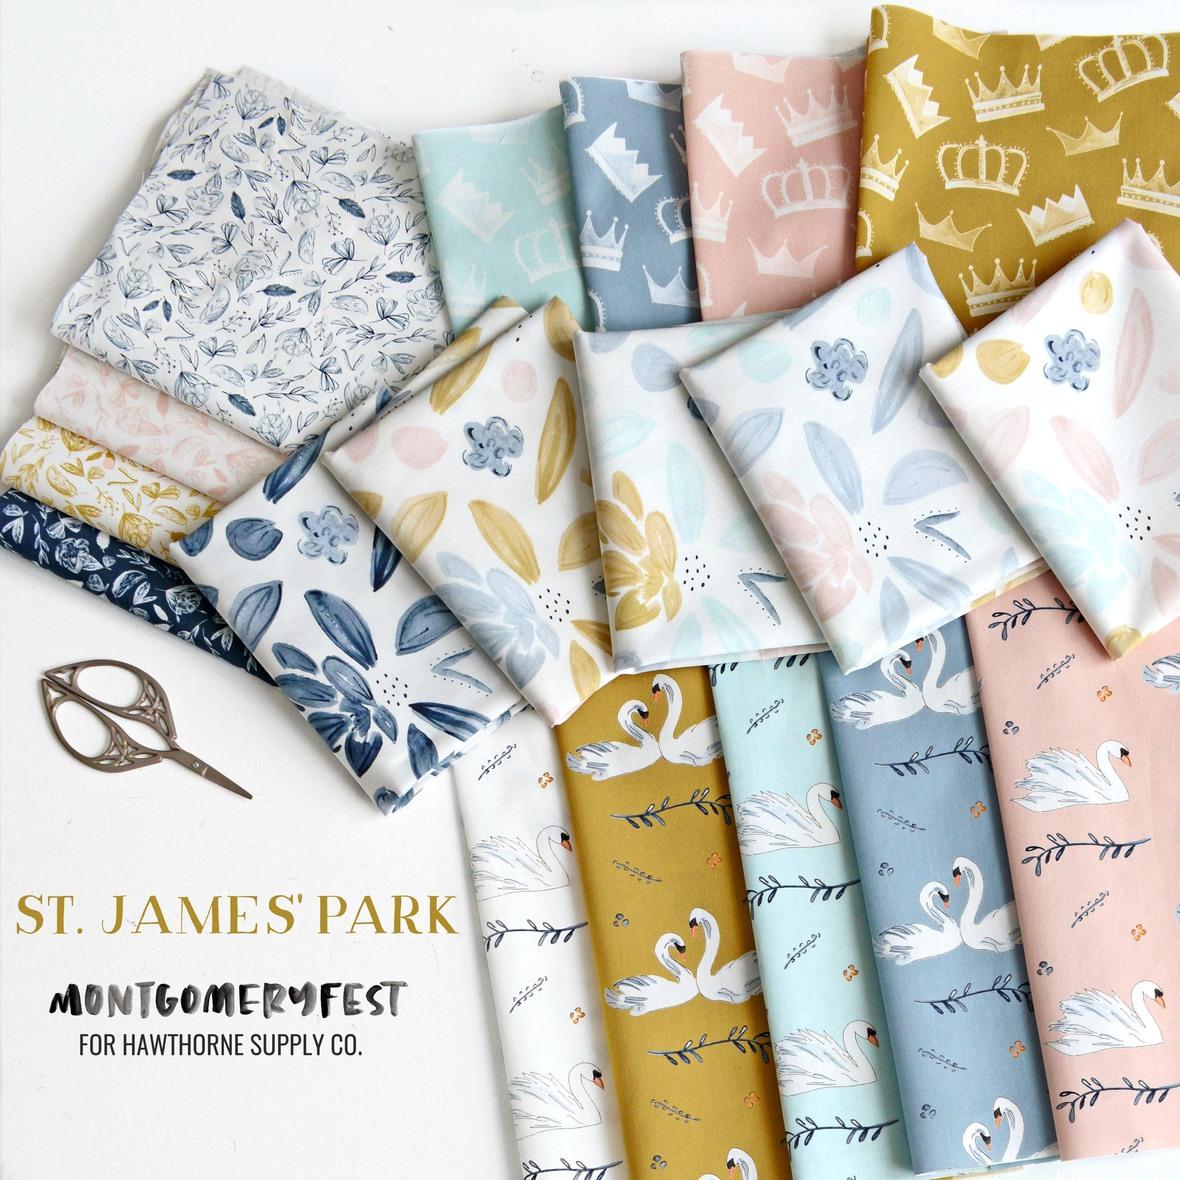 St James Park MontgomeryFest for Hawthorne Supply Co British Fabric